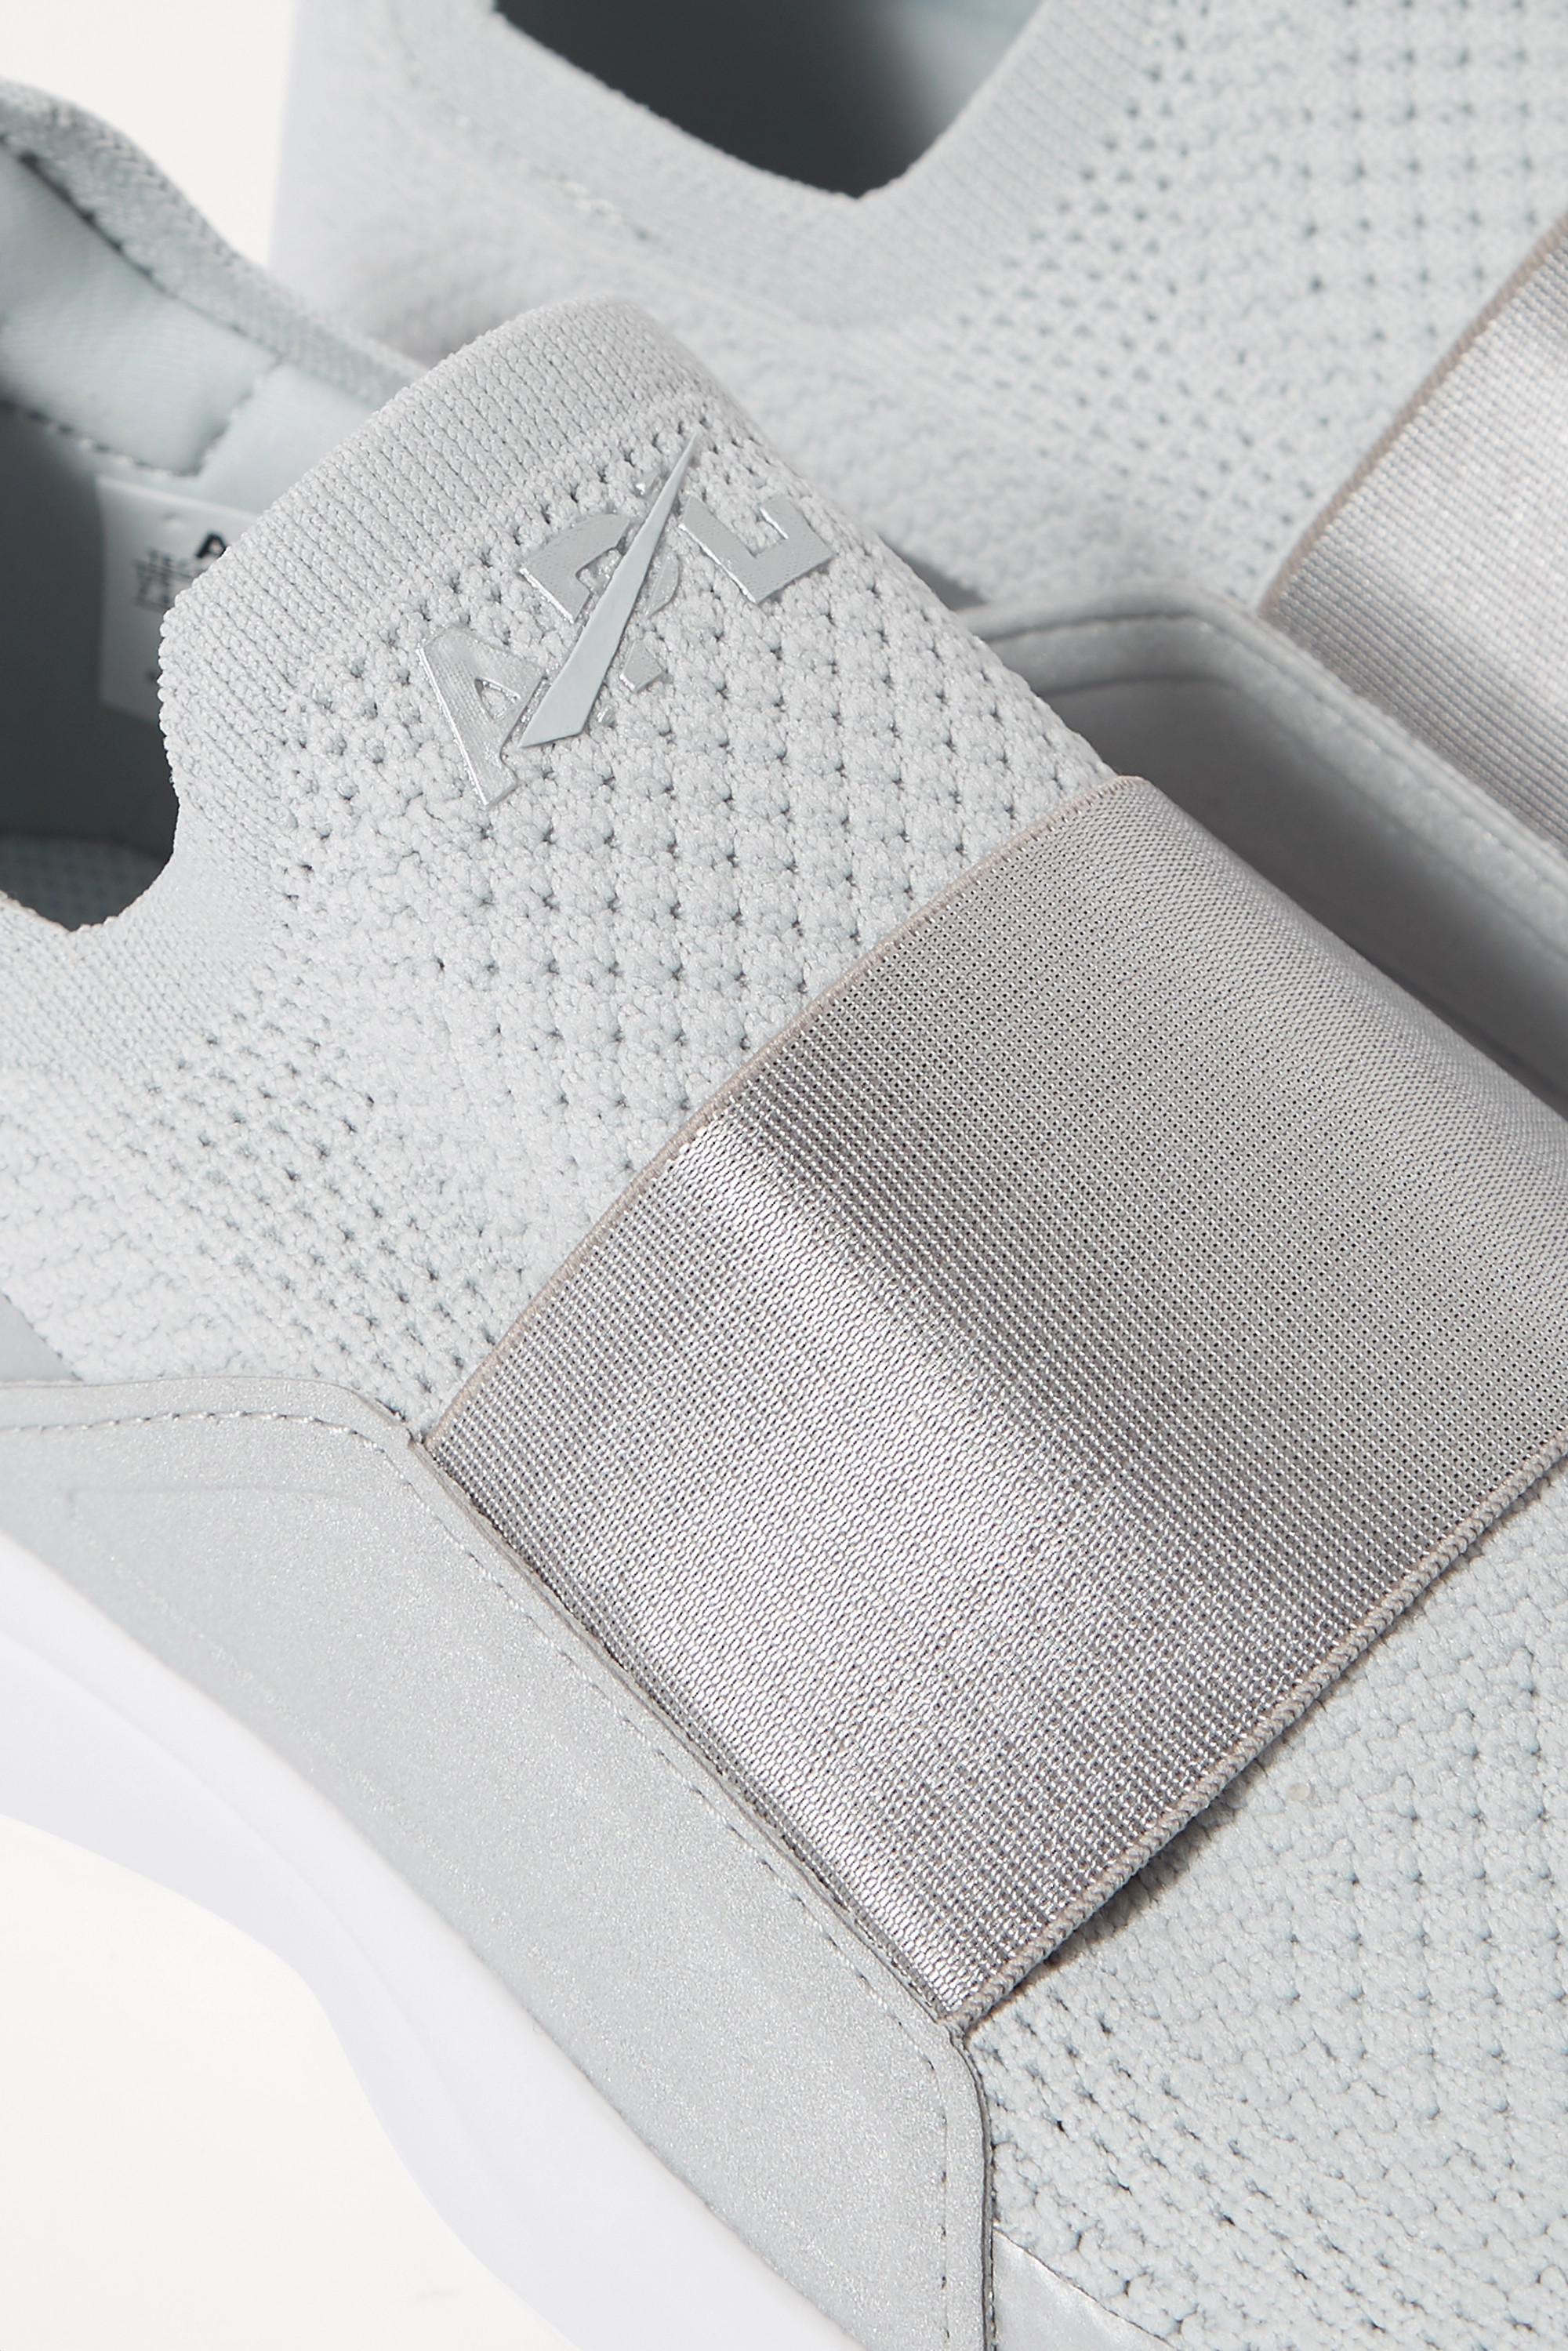 APL Athletic Propulsion Labs TechLoom Bliss mesh and neoprene slip-on sneakers